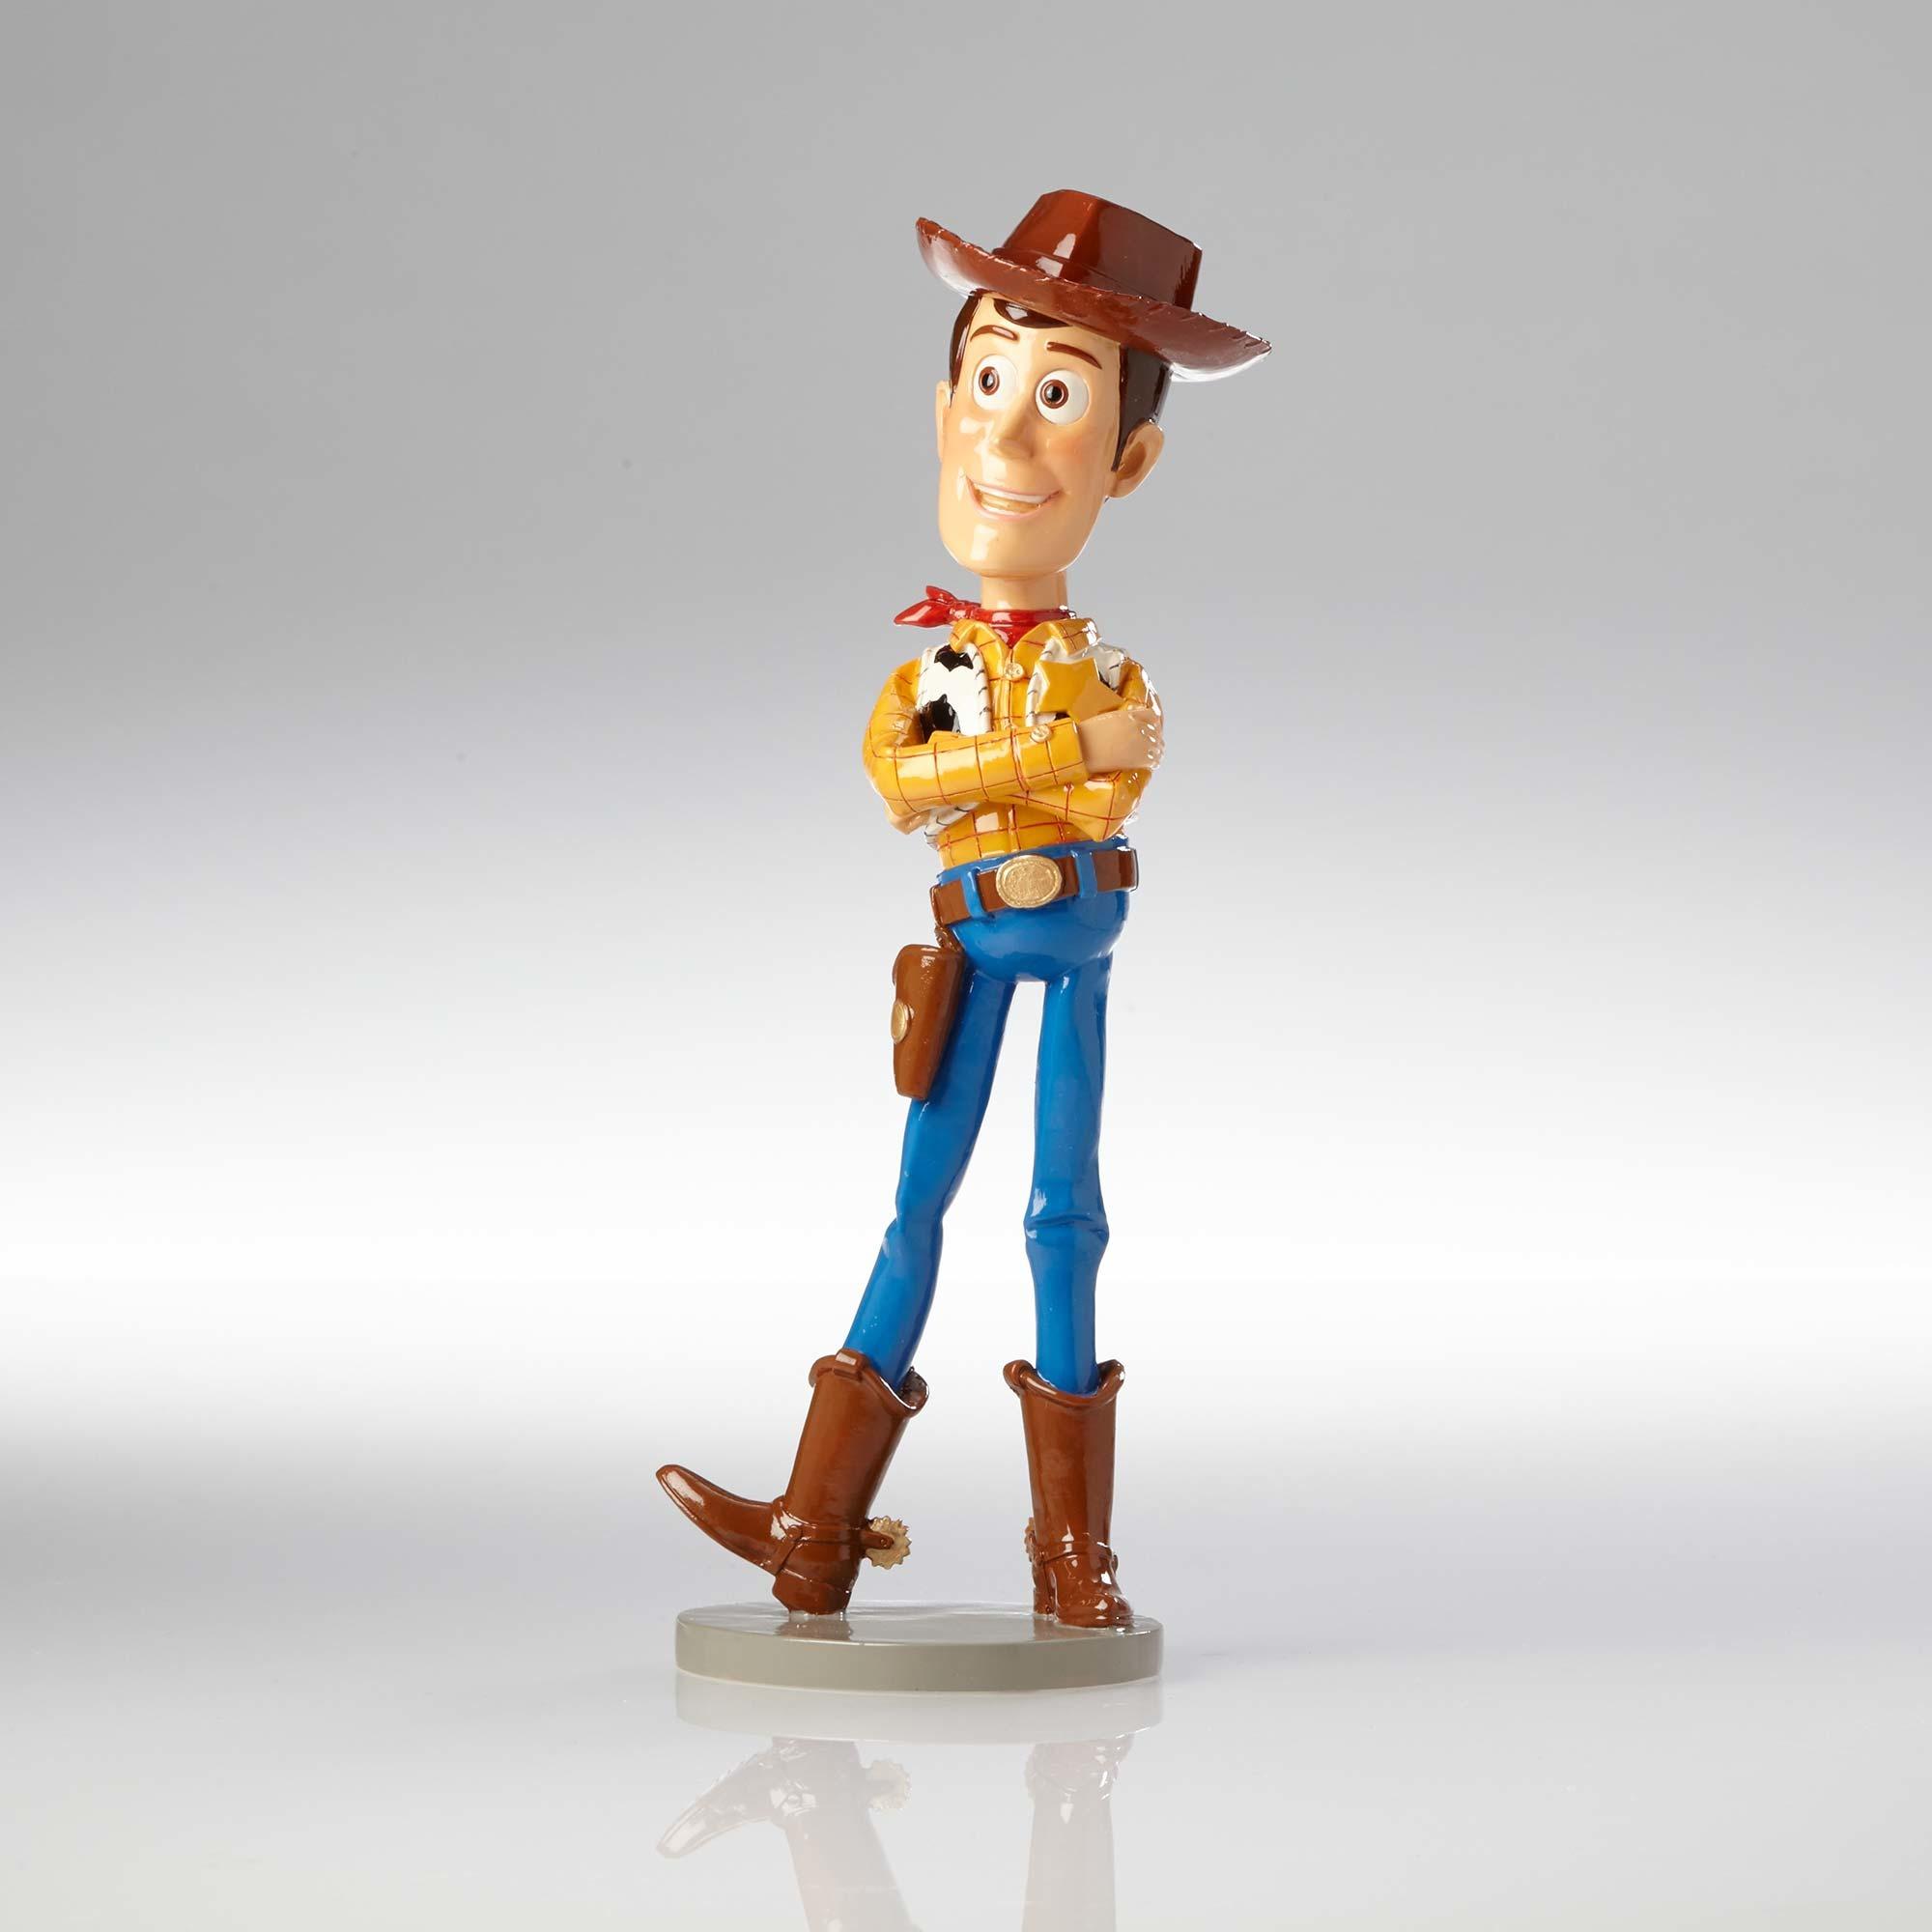 enesco h6 disney showcase toy story sheriff woody figurine. Black Bedroom Furniture Sets. Home Design Ideas